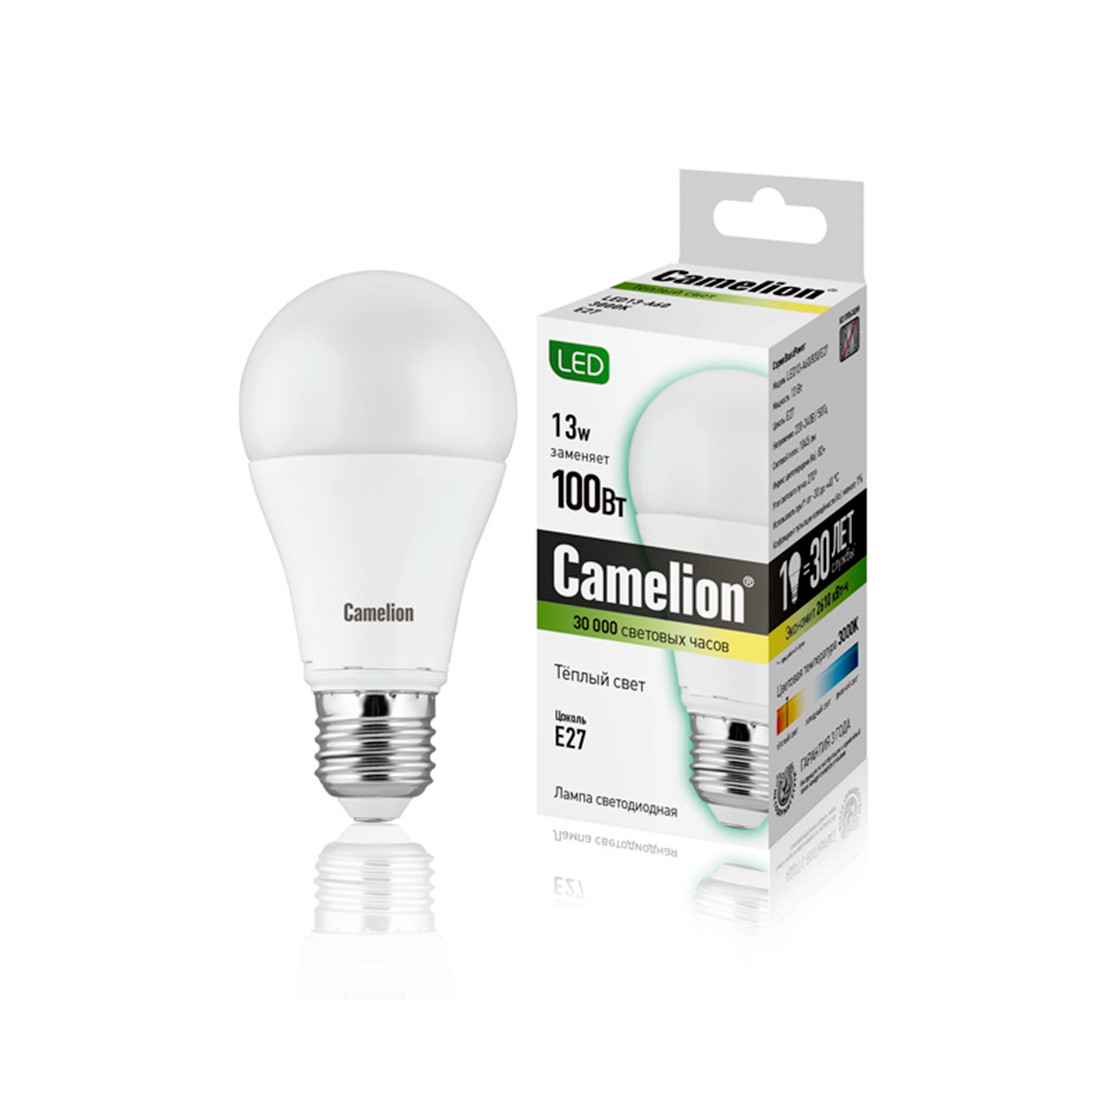 Эл. лампа светодиодная Camelion А60/3000К/E27/13Вт, Тёплый